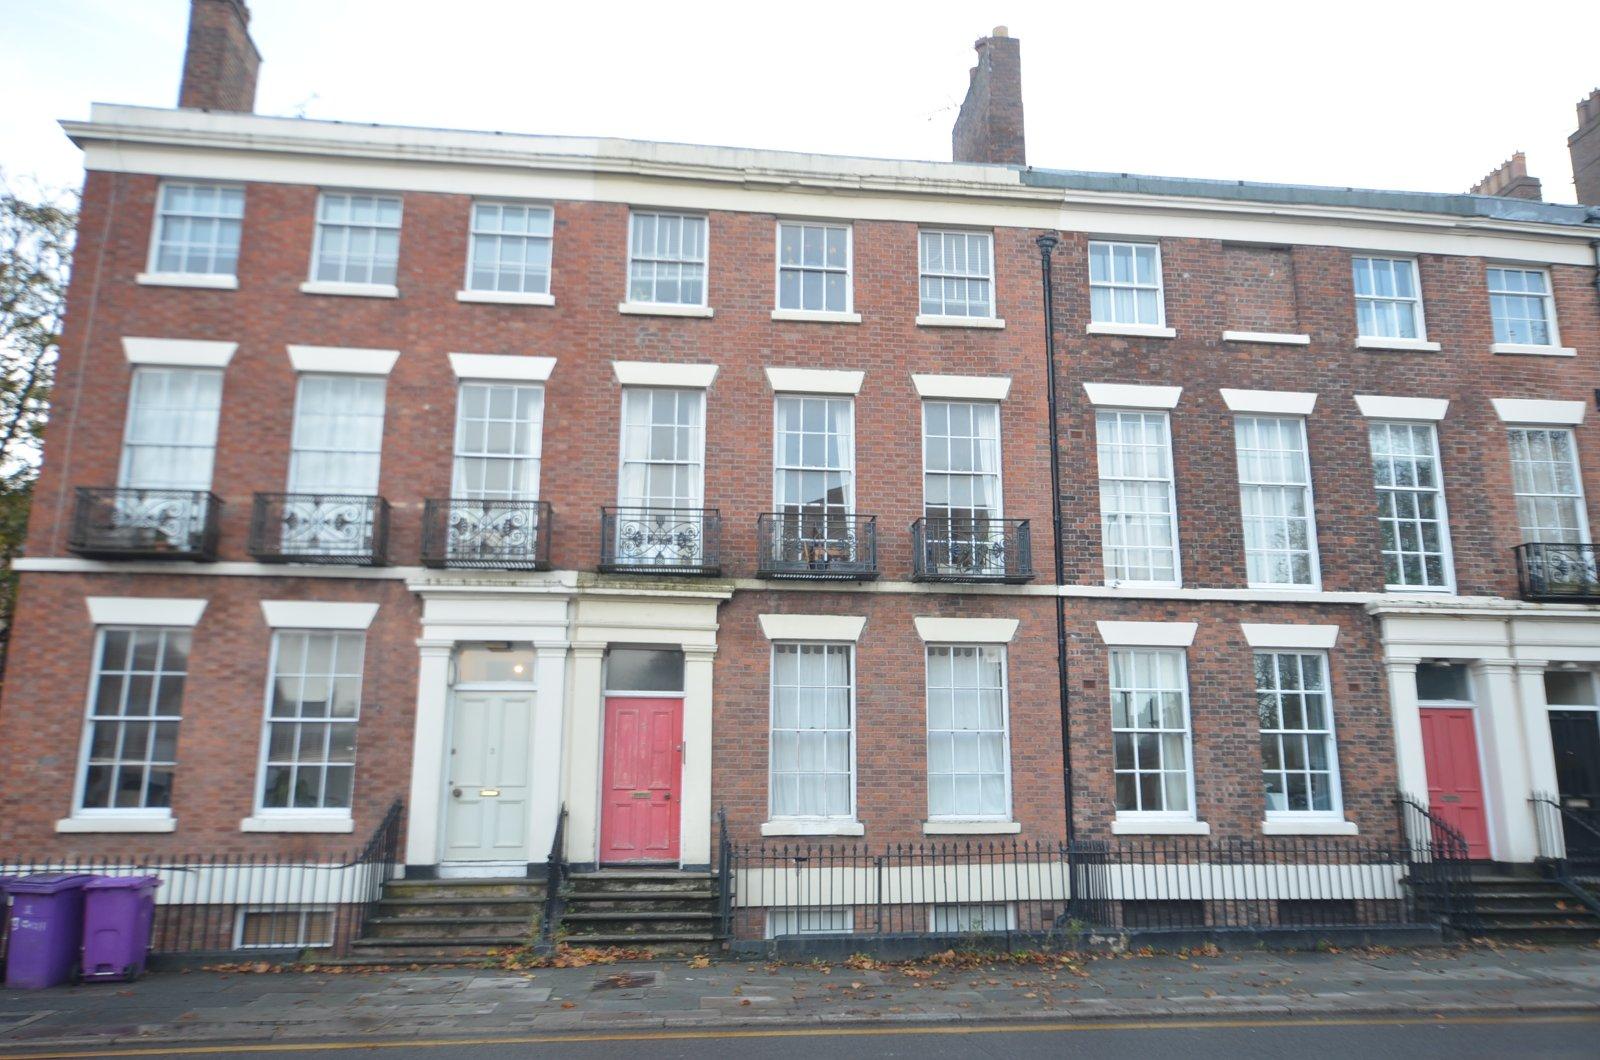 Catharine Street, Liverpool, Merseyside, L8 7NH